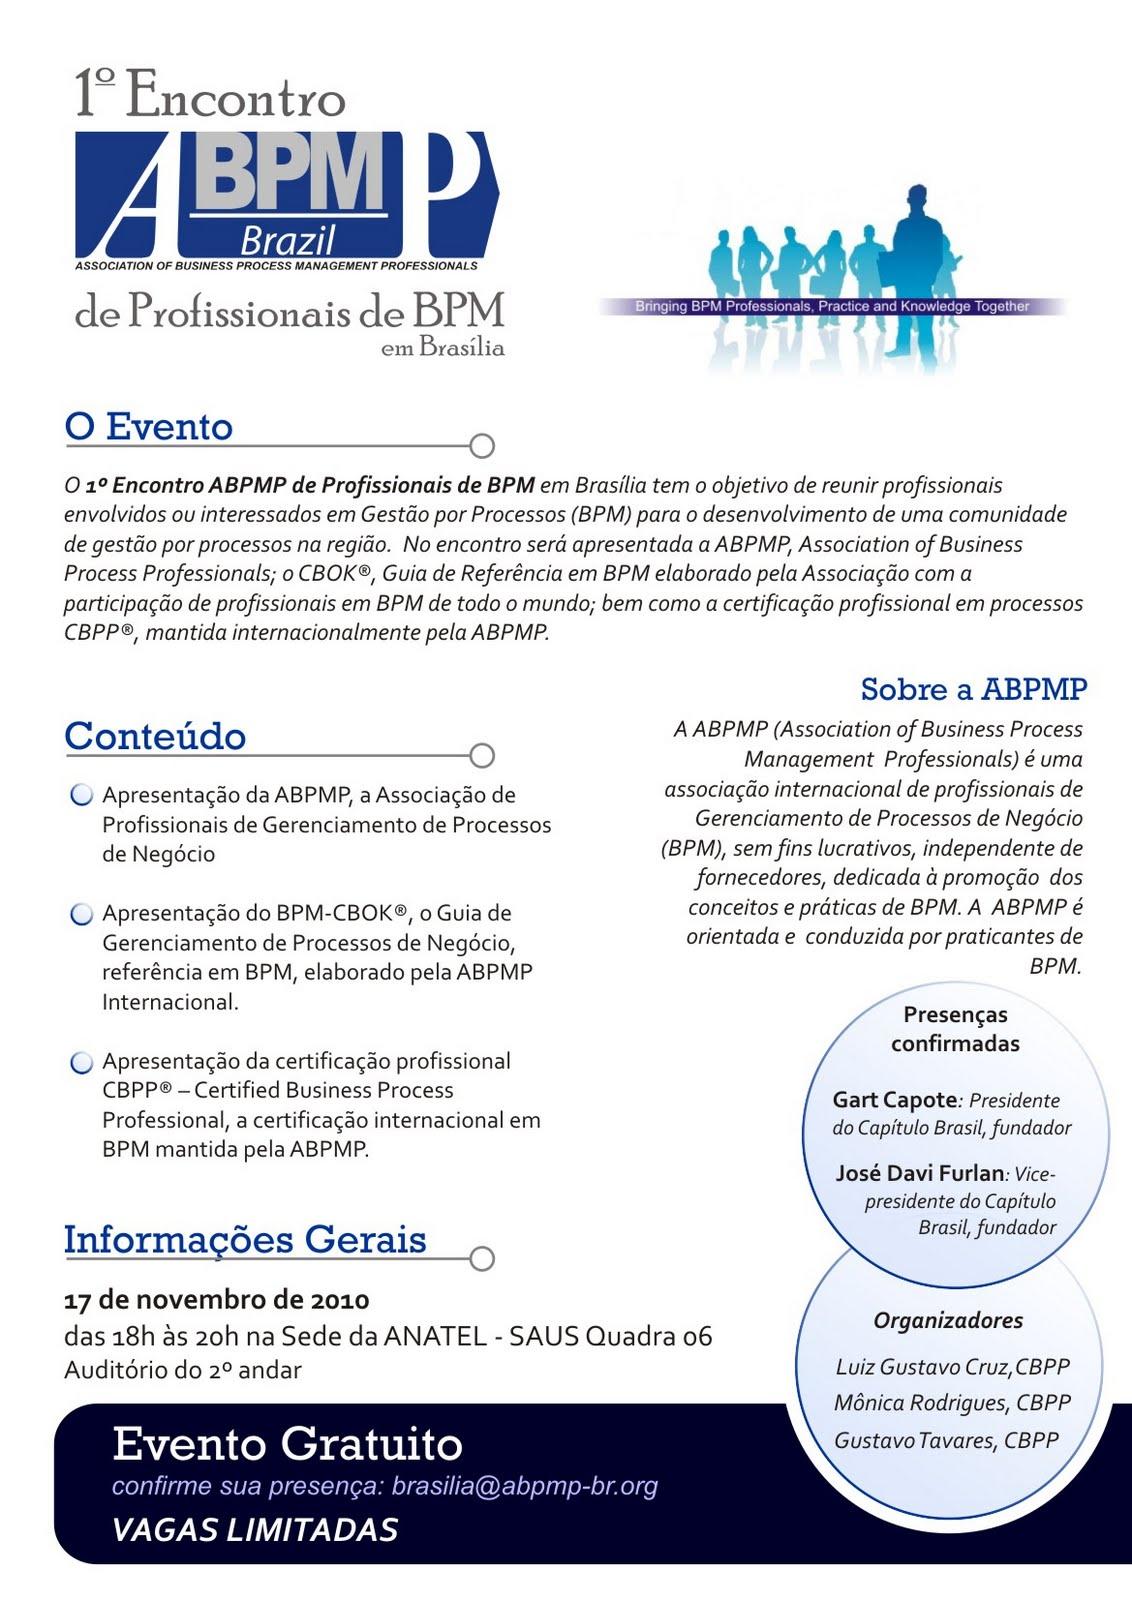 Gart Capote Mundo Bpm 2010